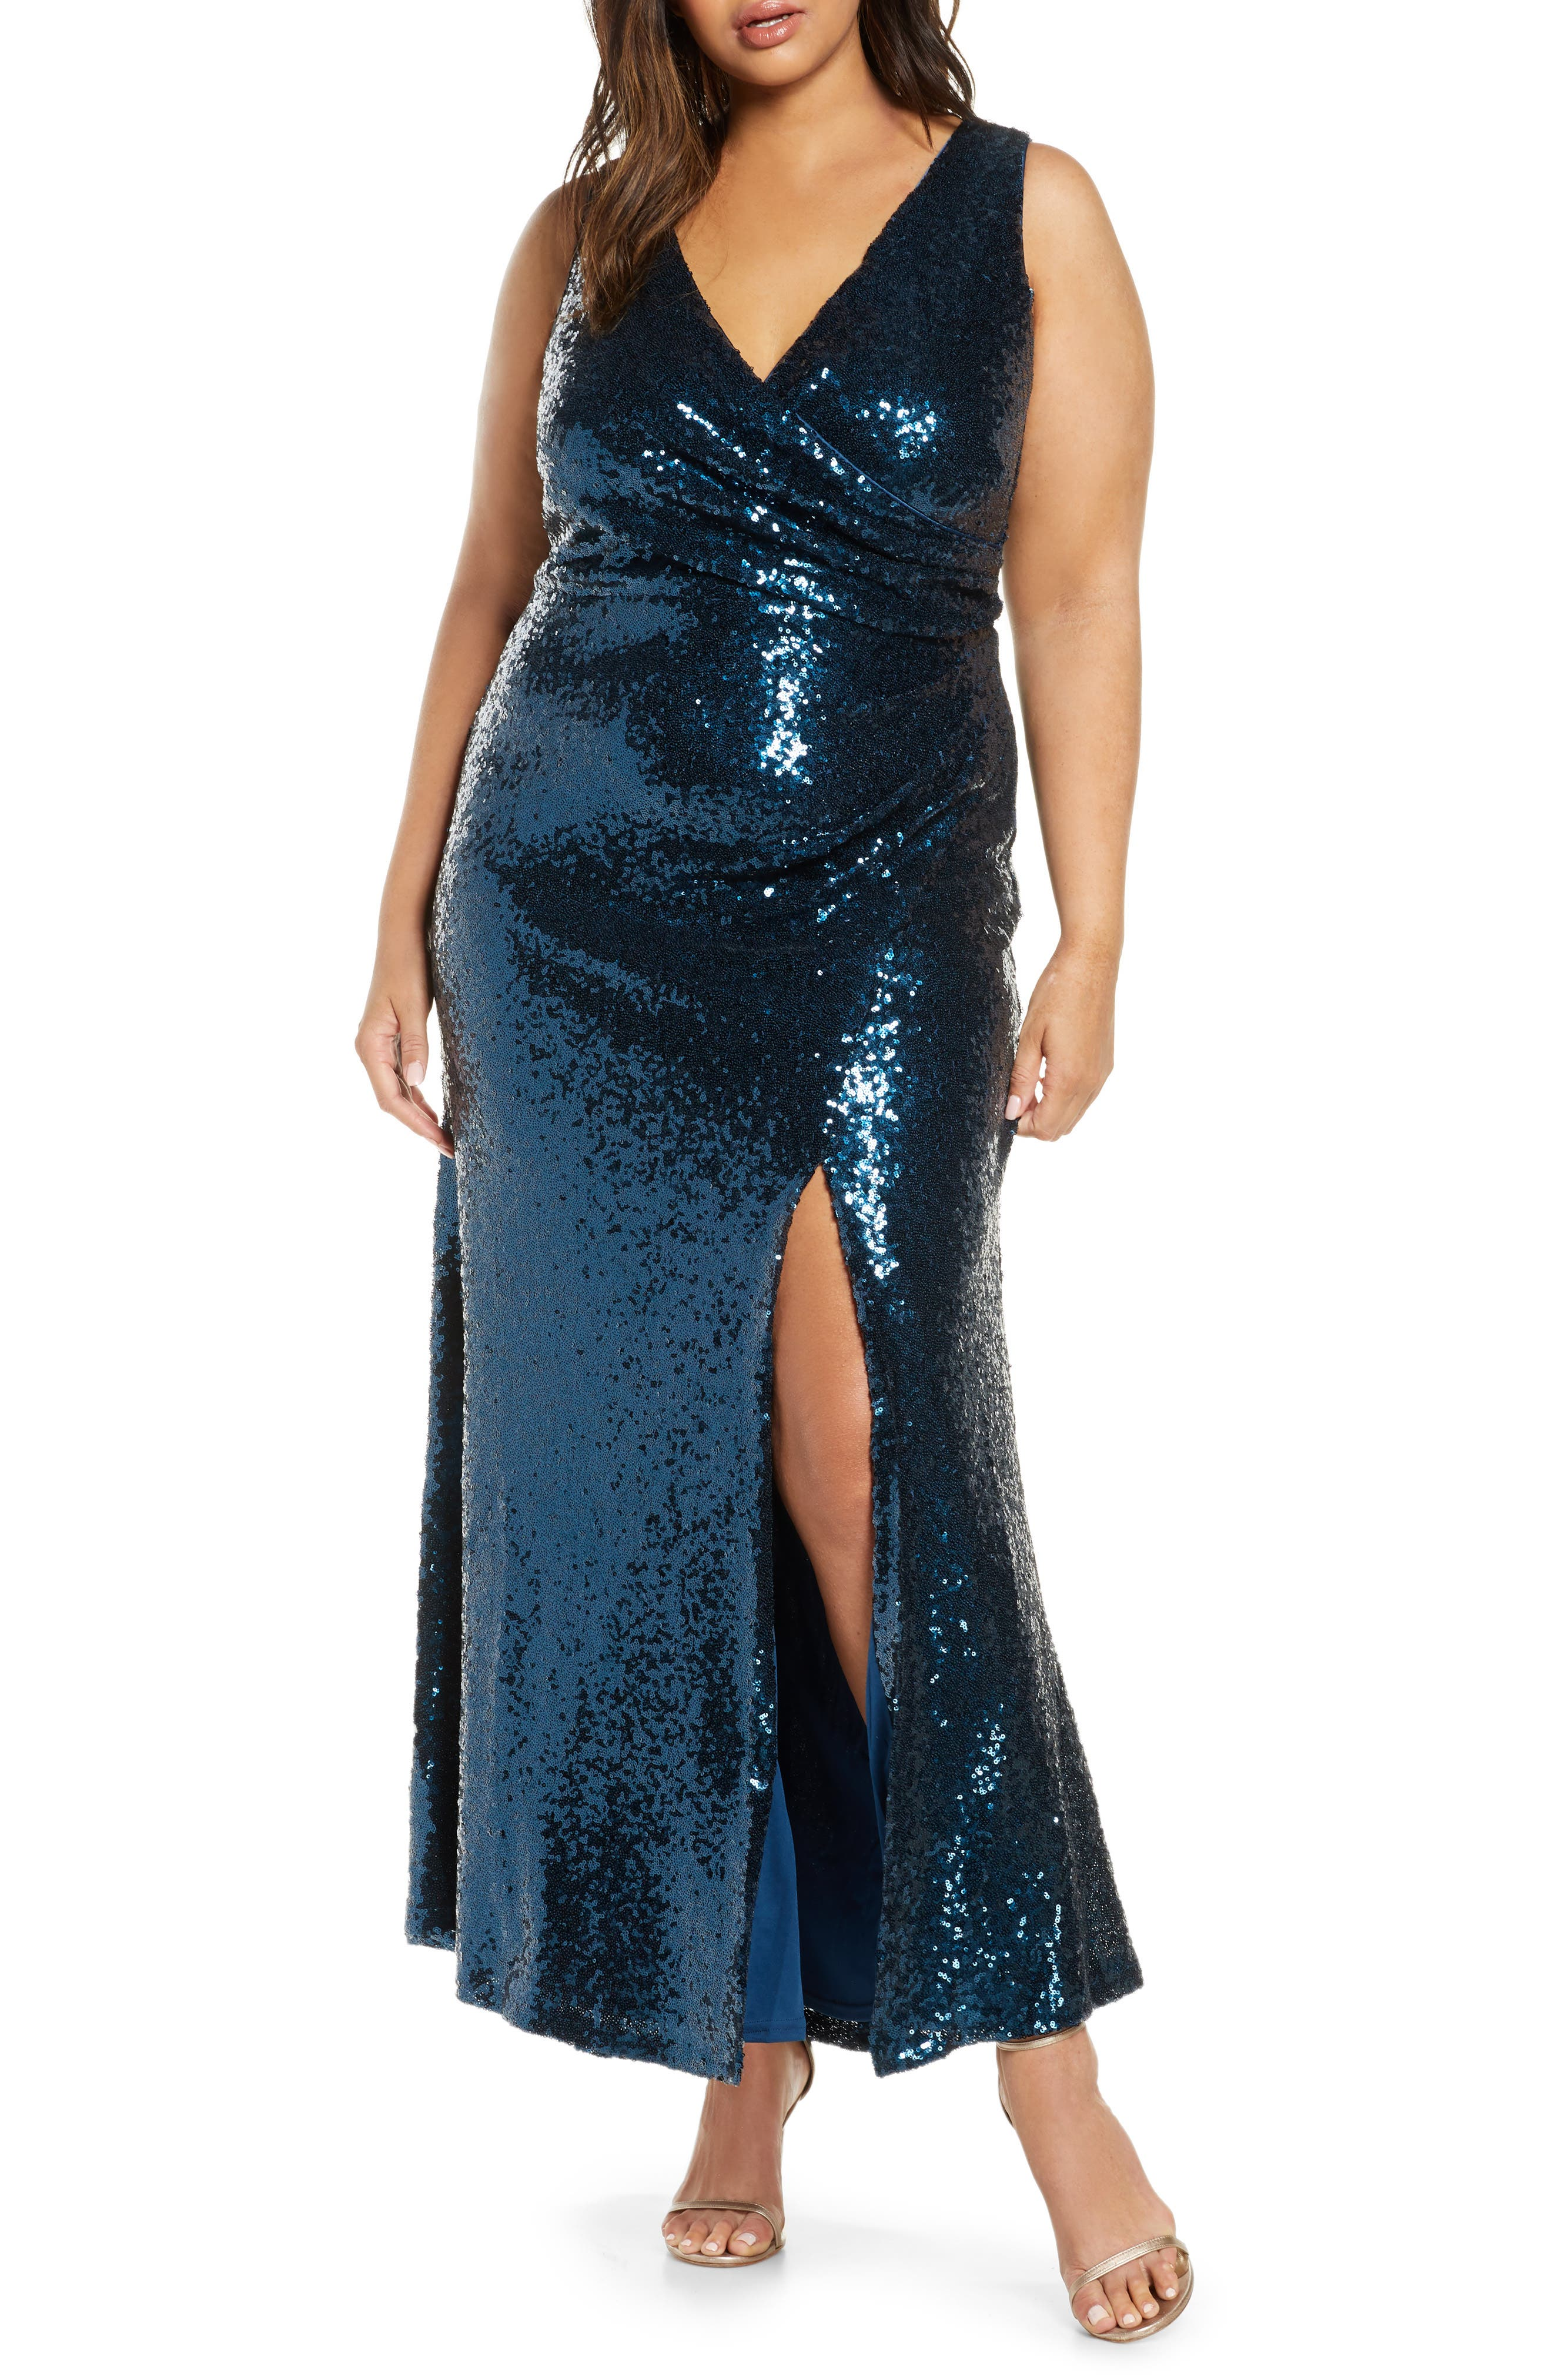 70s Dresses – Disco Dress, Hippie Dress, Wrap Dress Plus Size Womens Vince Camuto Sleeveless Sequin Gown $308.00 AT vintagedancer.com